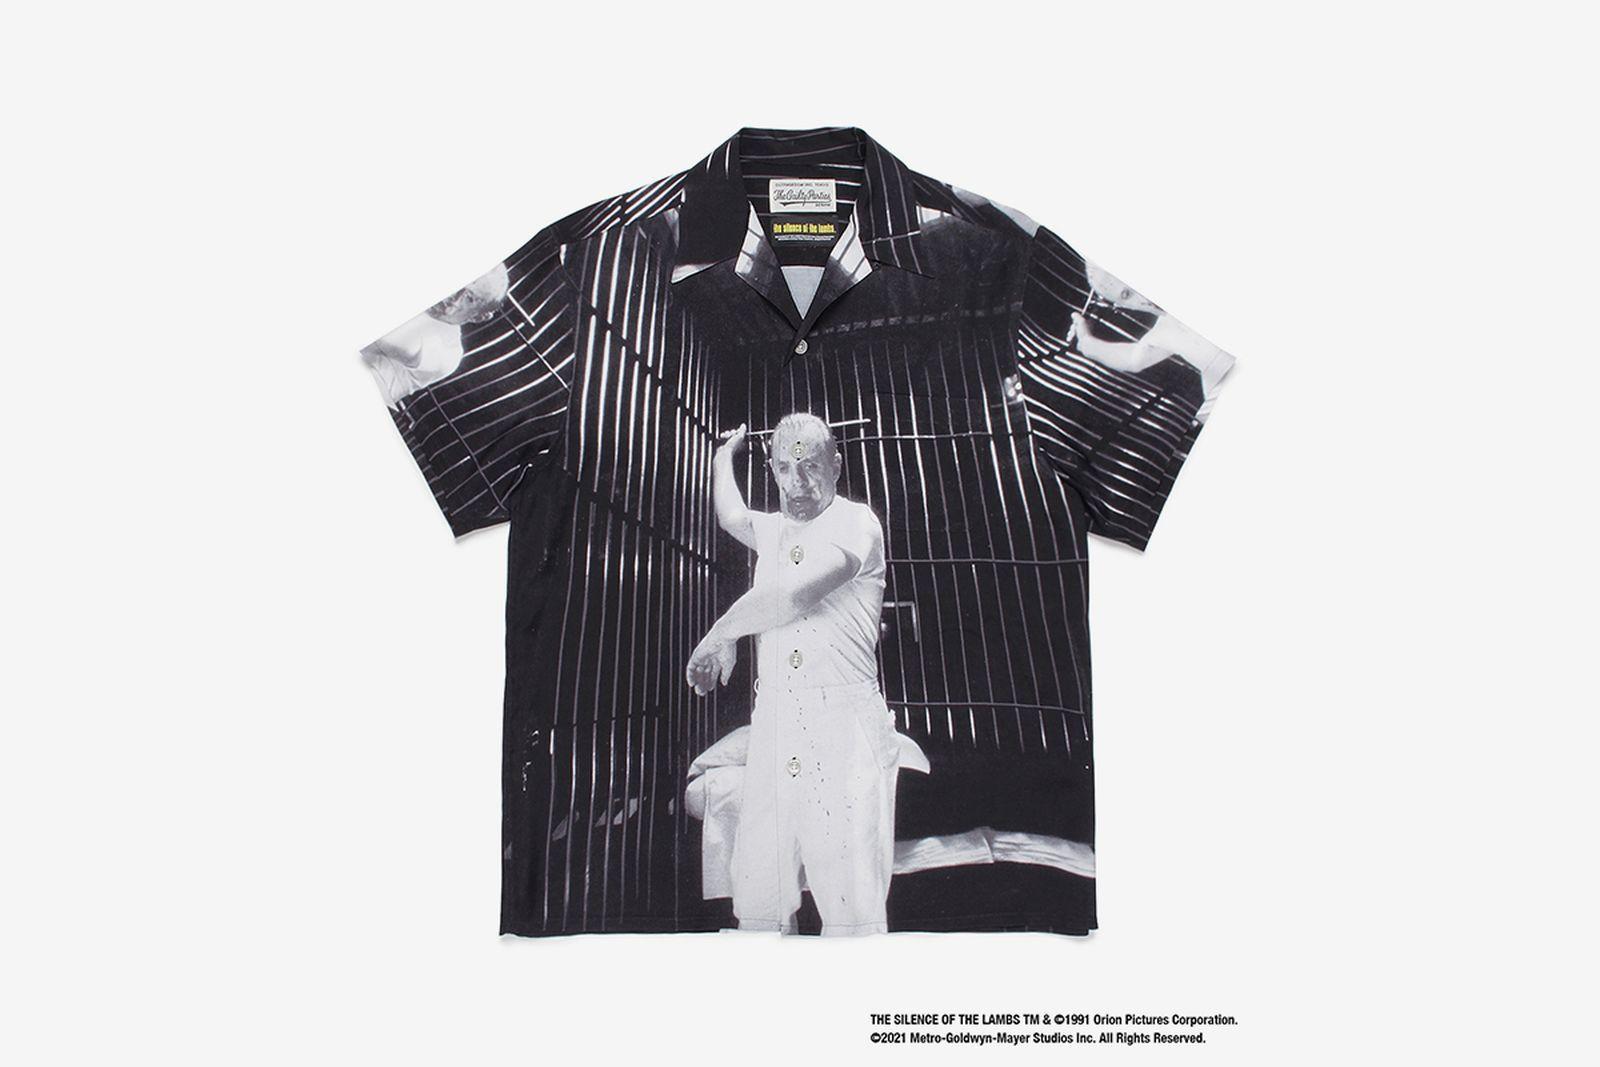 wacko Maria x silence of the lambs shirt